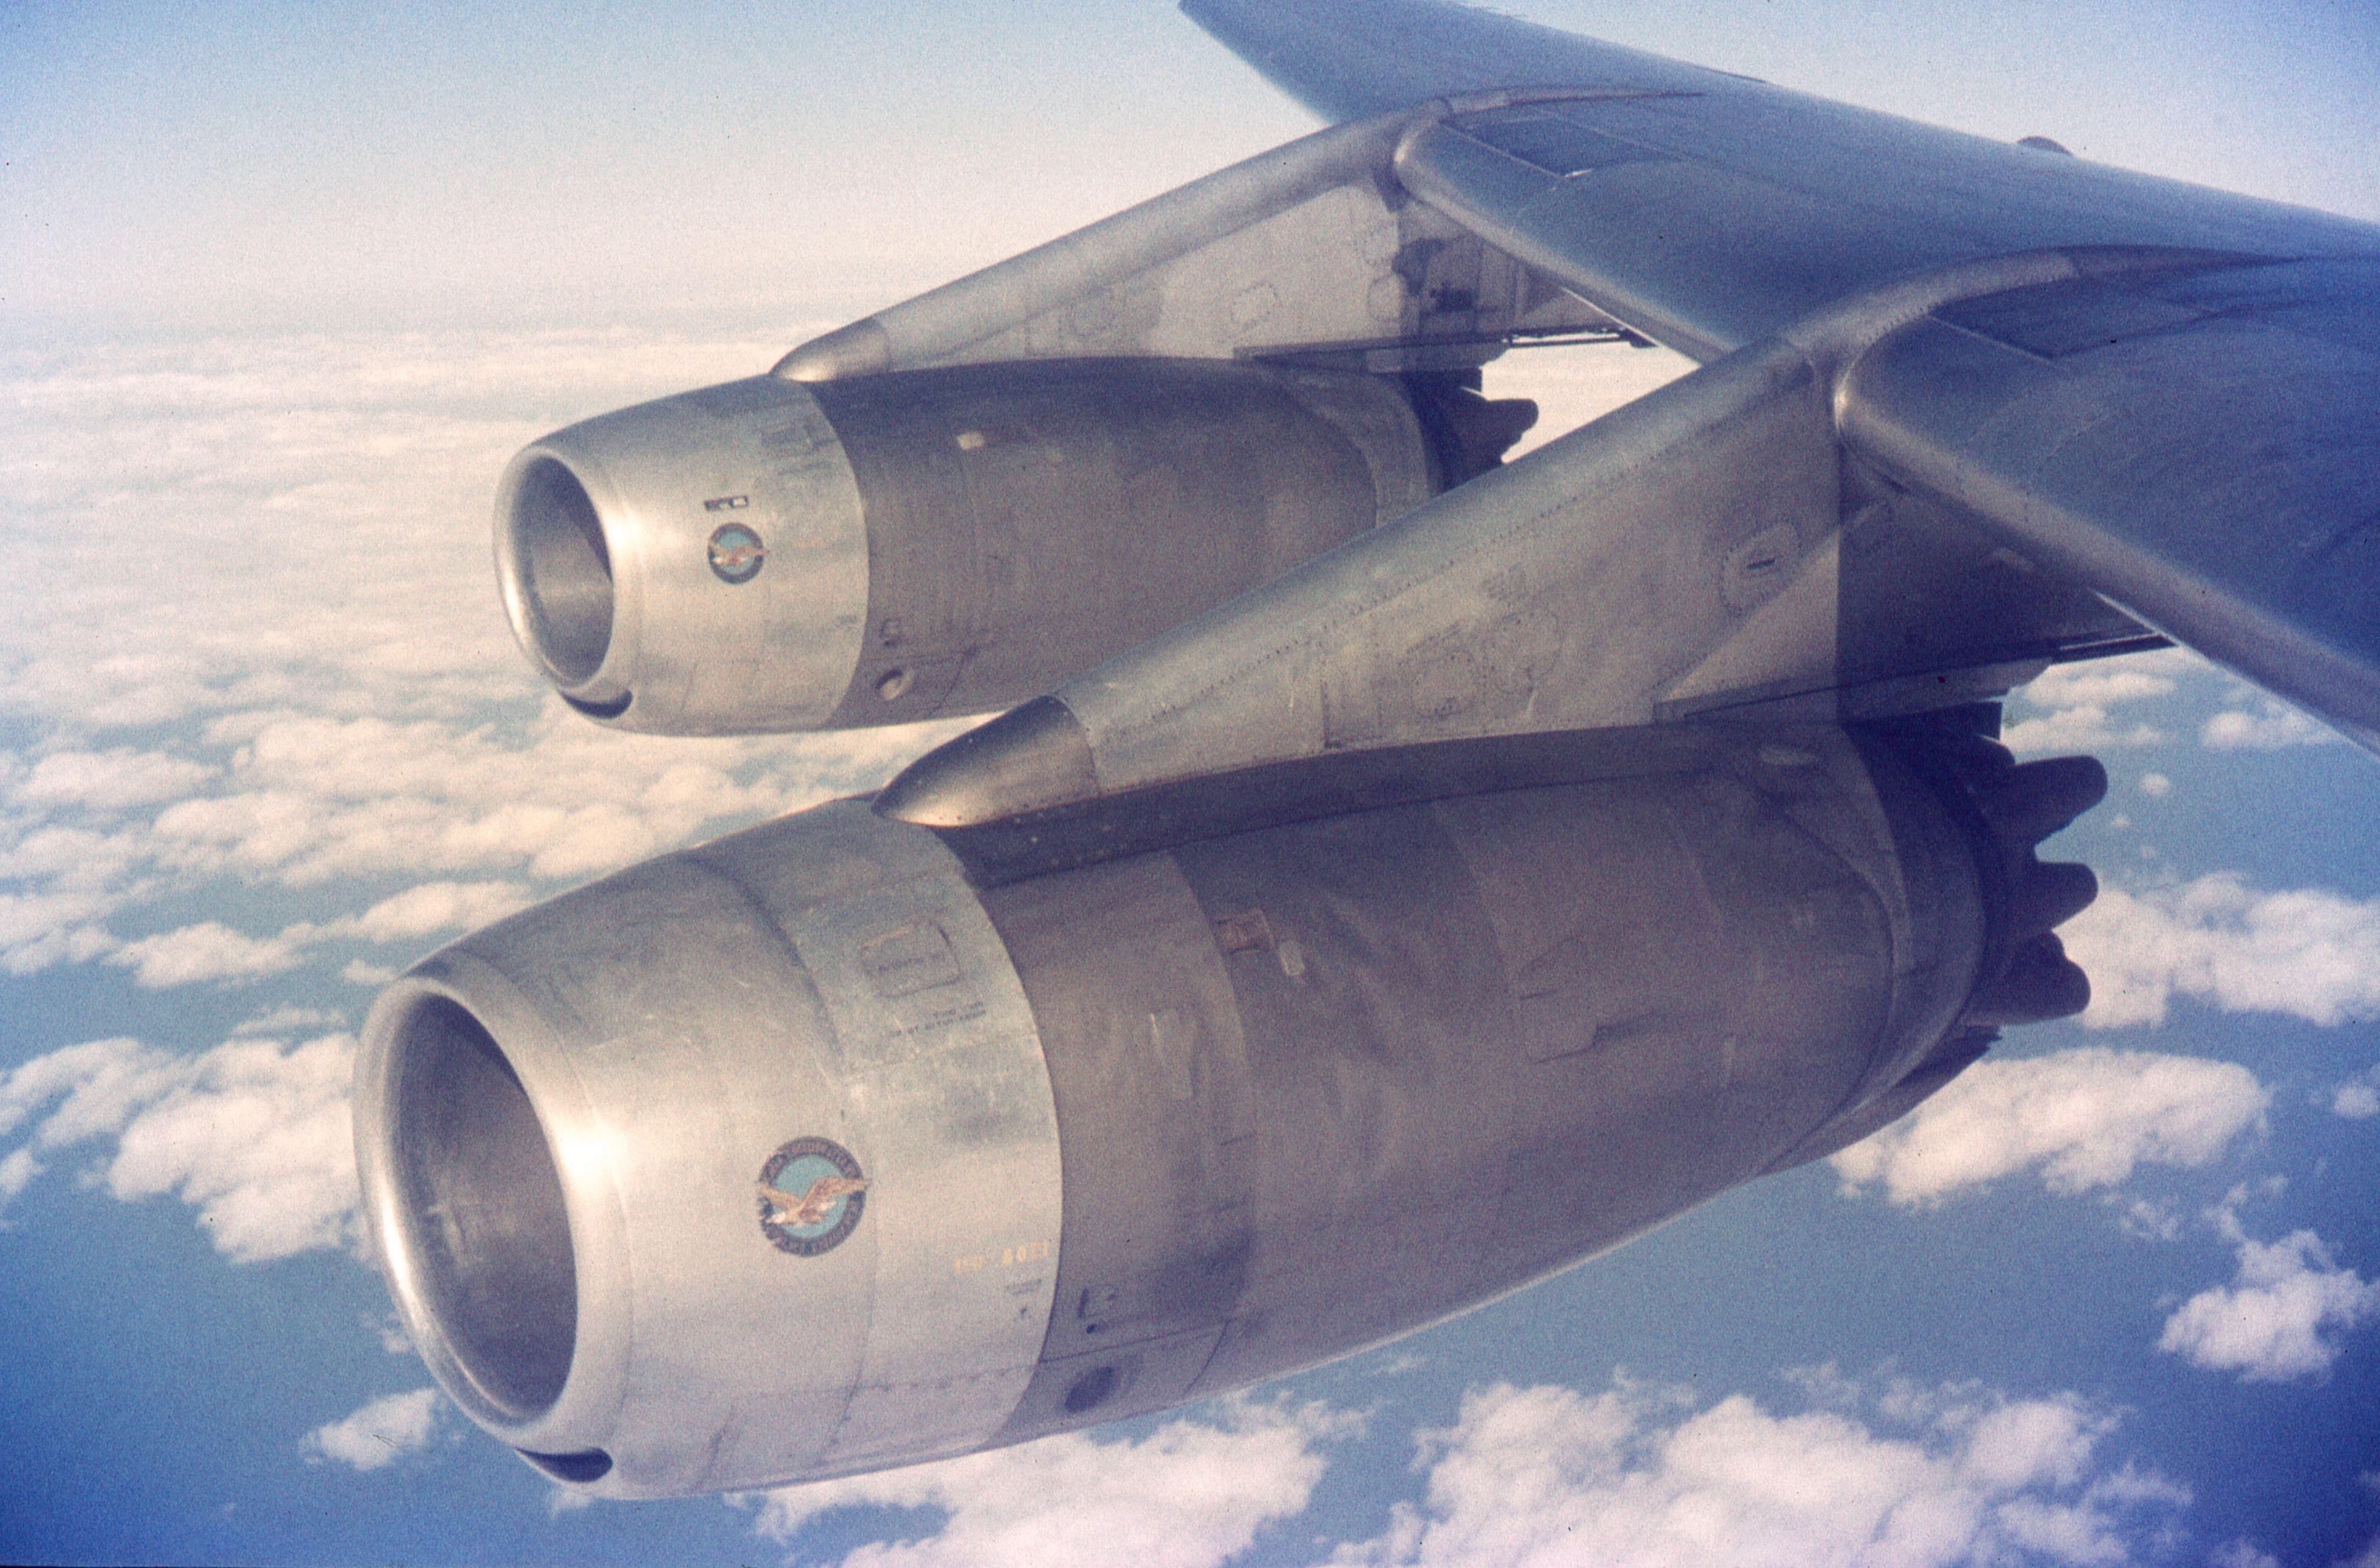 KLM_DC-8-33_(7491675744).jpg (3916×2580)